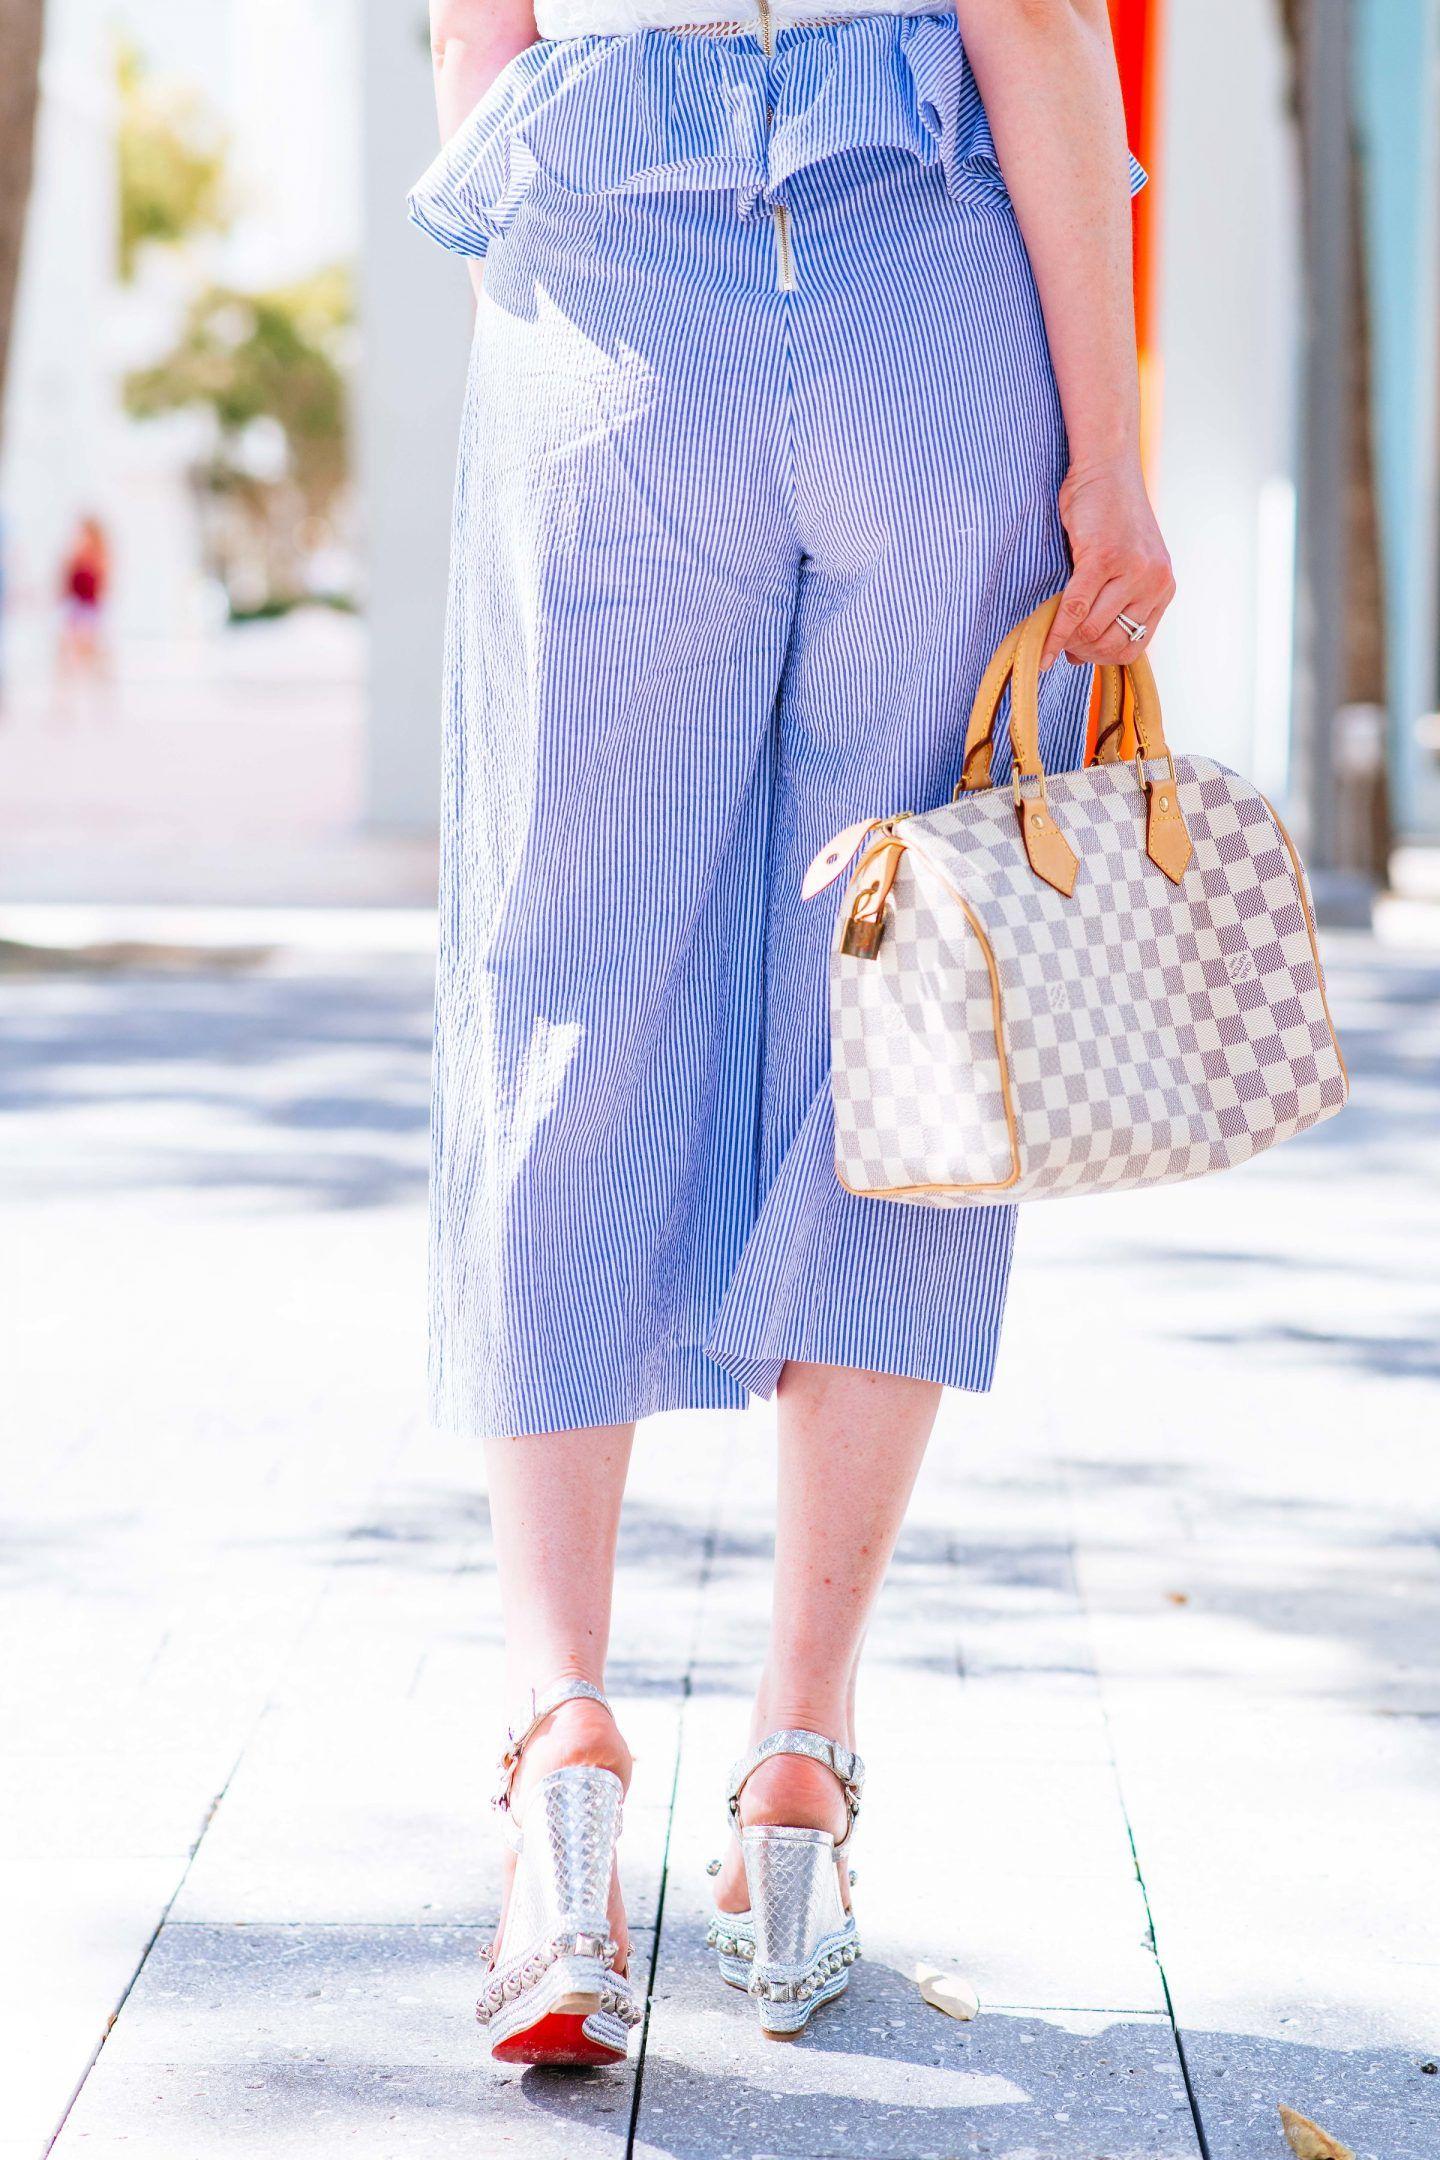 0c2175f4c551 7 summer fashion hacks to beat the heat